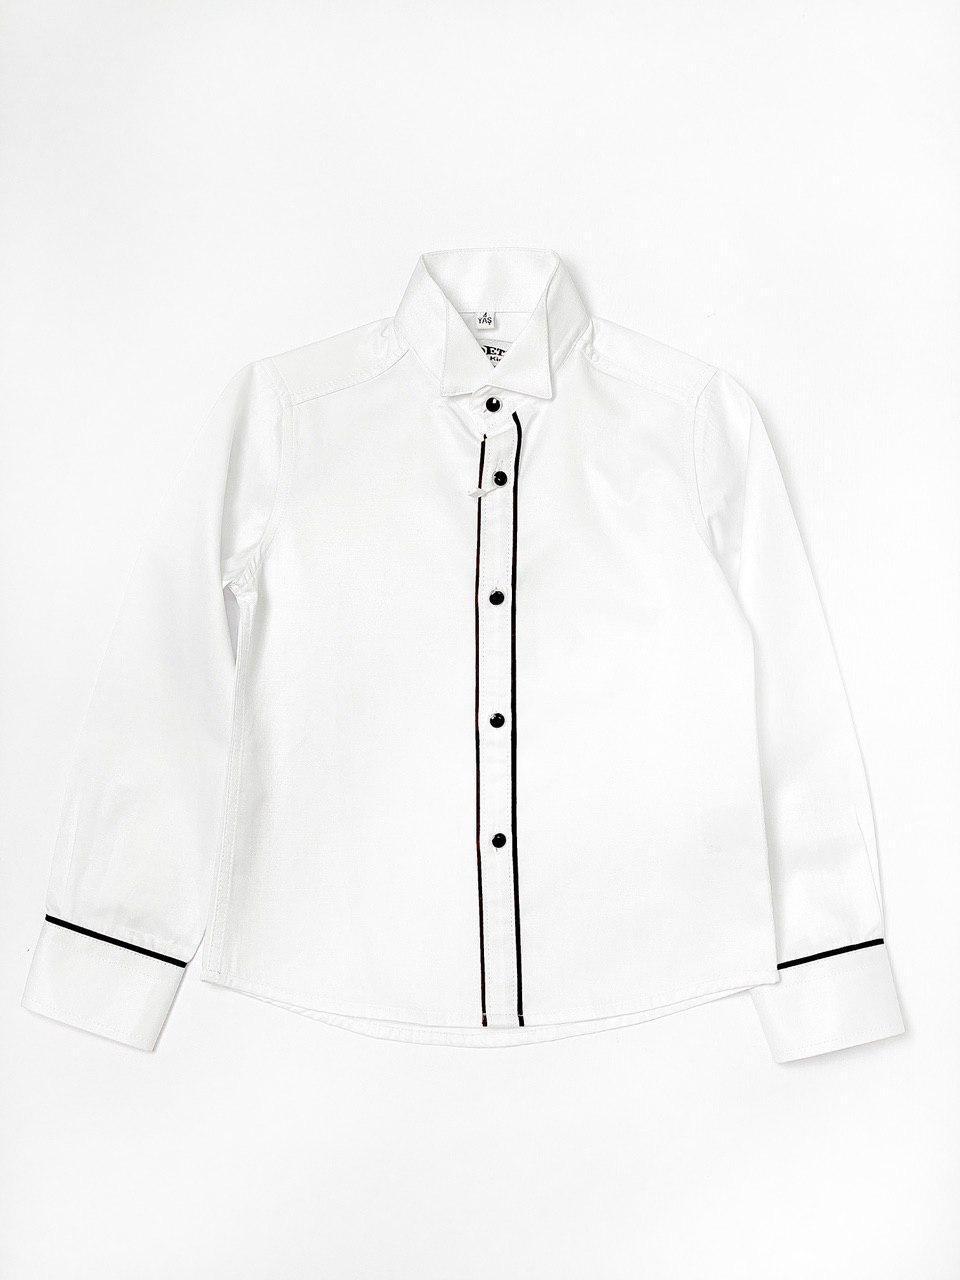 Рубашка для мальчика, размеры 1г.